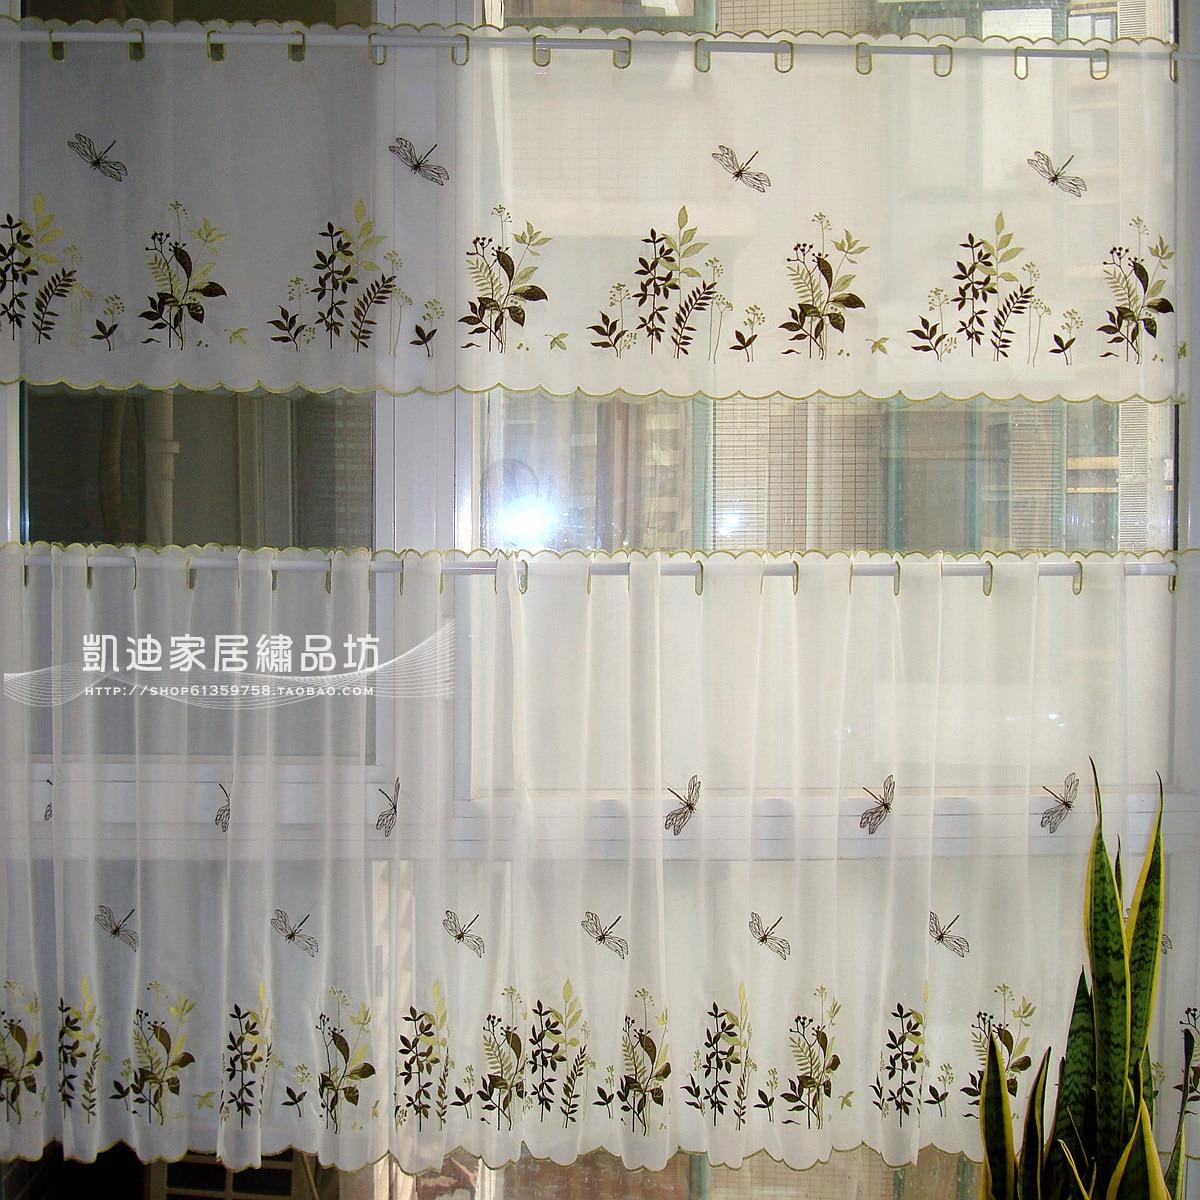 Telas para cortinas de cocina compra lotes baratos de telas para cortinas de cocina de china - Valence rideau pour cuisine ...